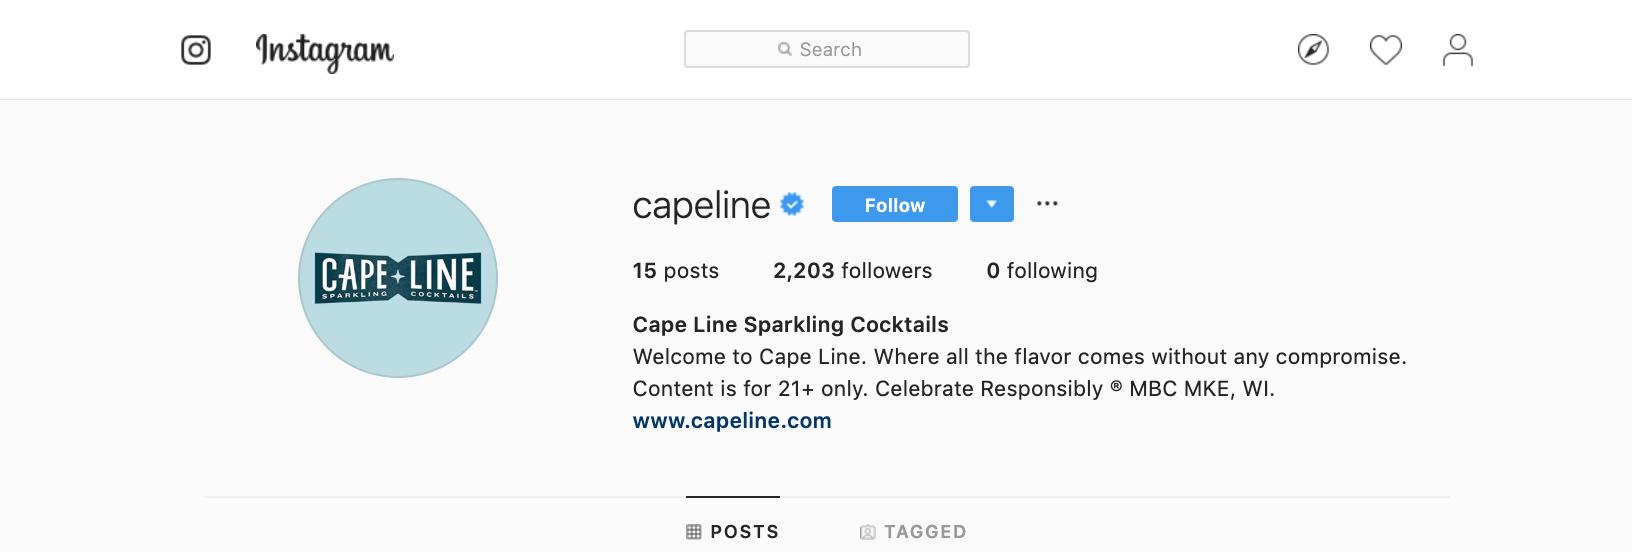 capeline_cover.jpg